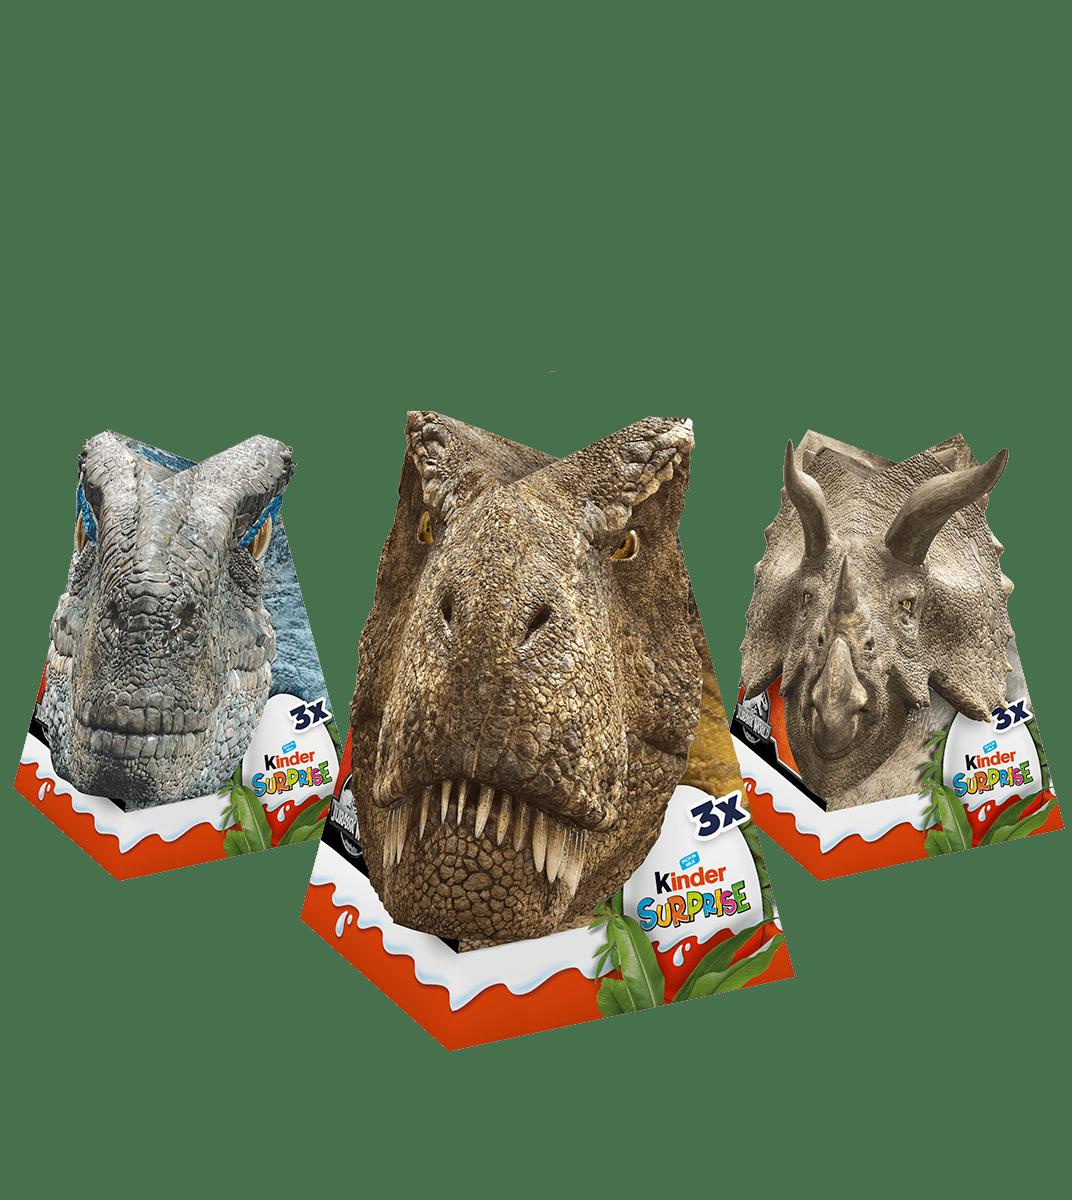 Kinder Surprise Jurassic World 60g (3 eggs)